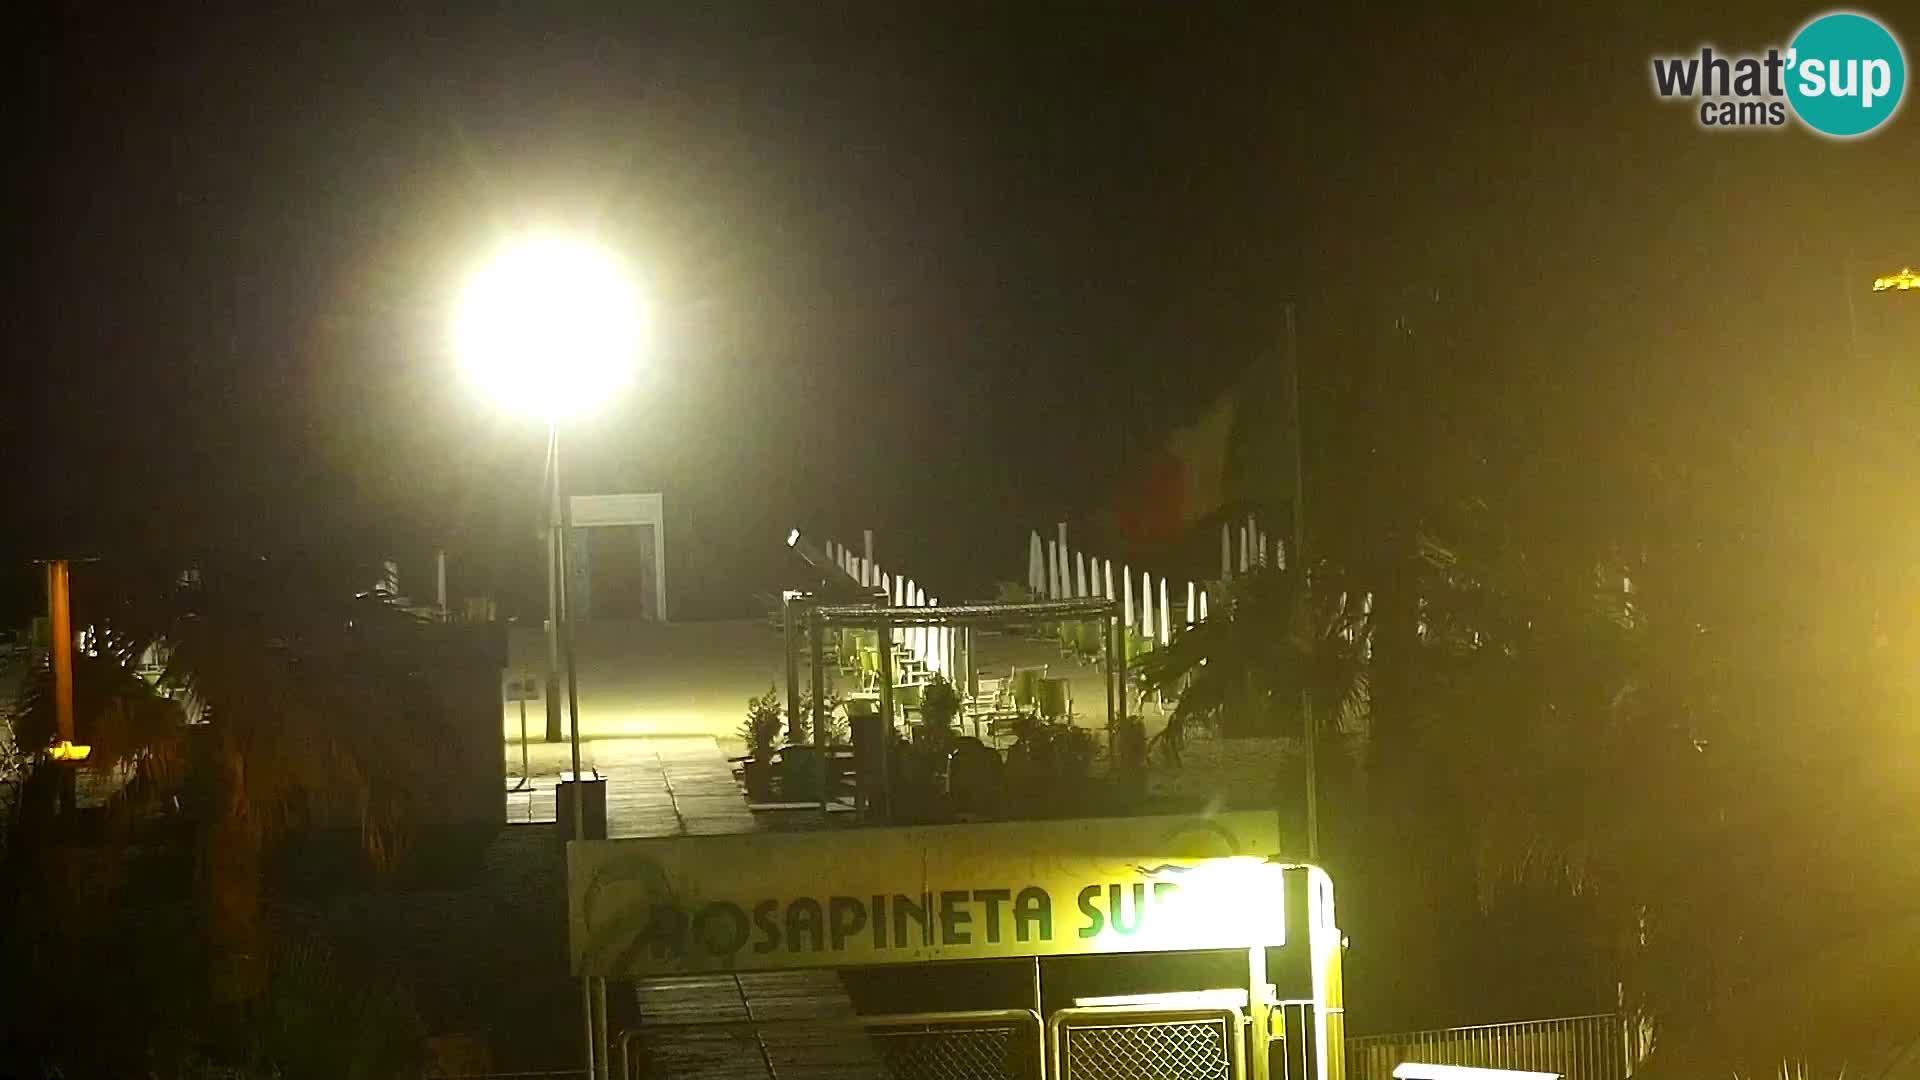 Resort Rosapineta Sud – livecam